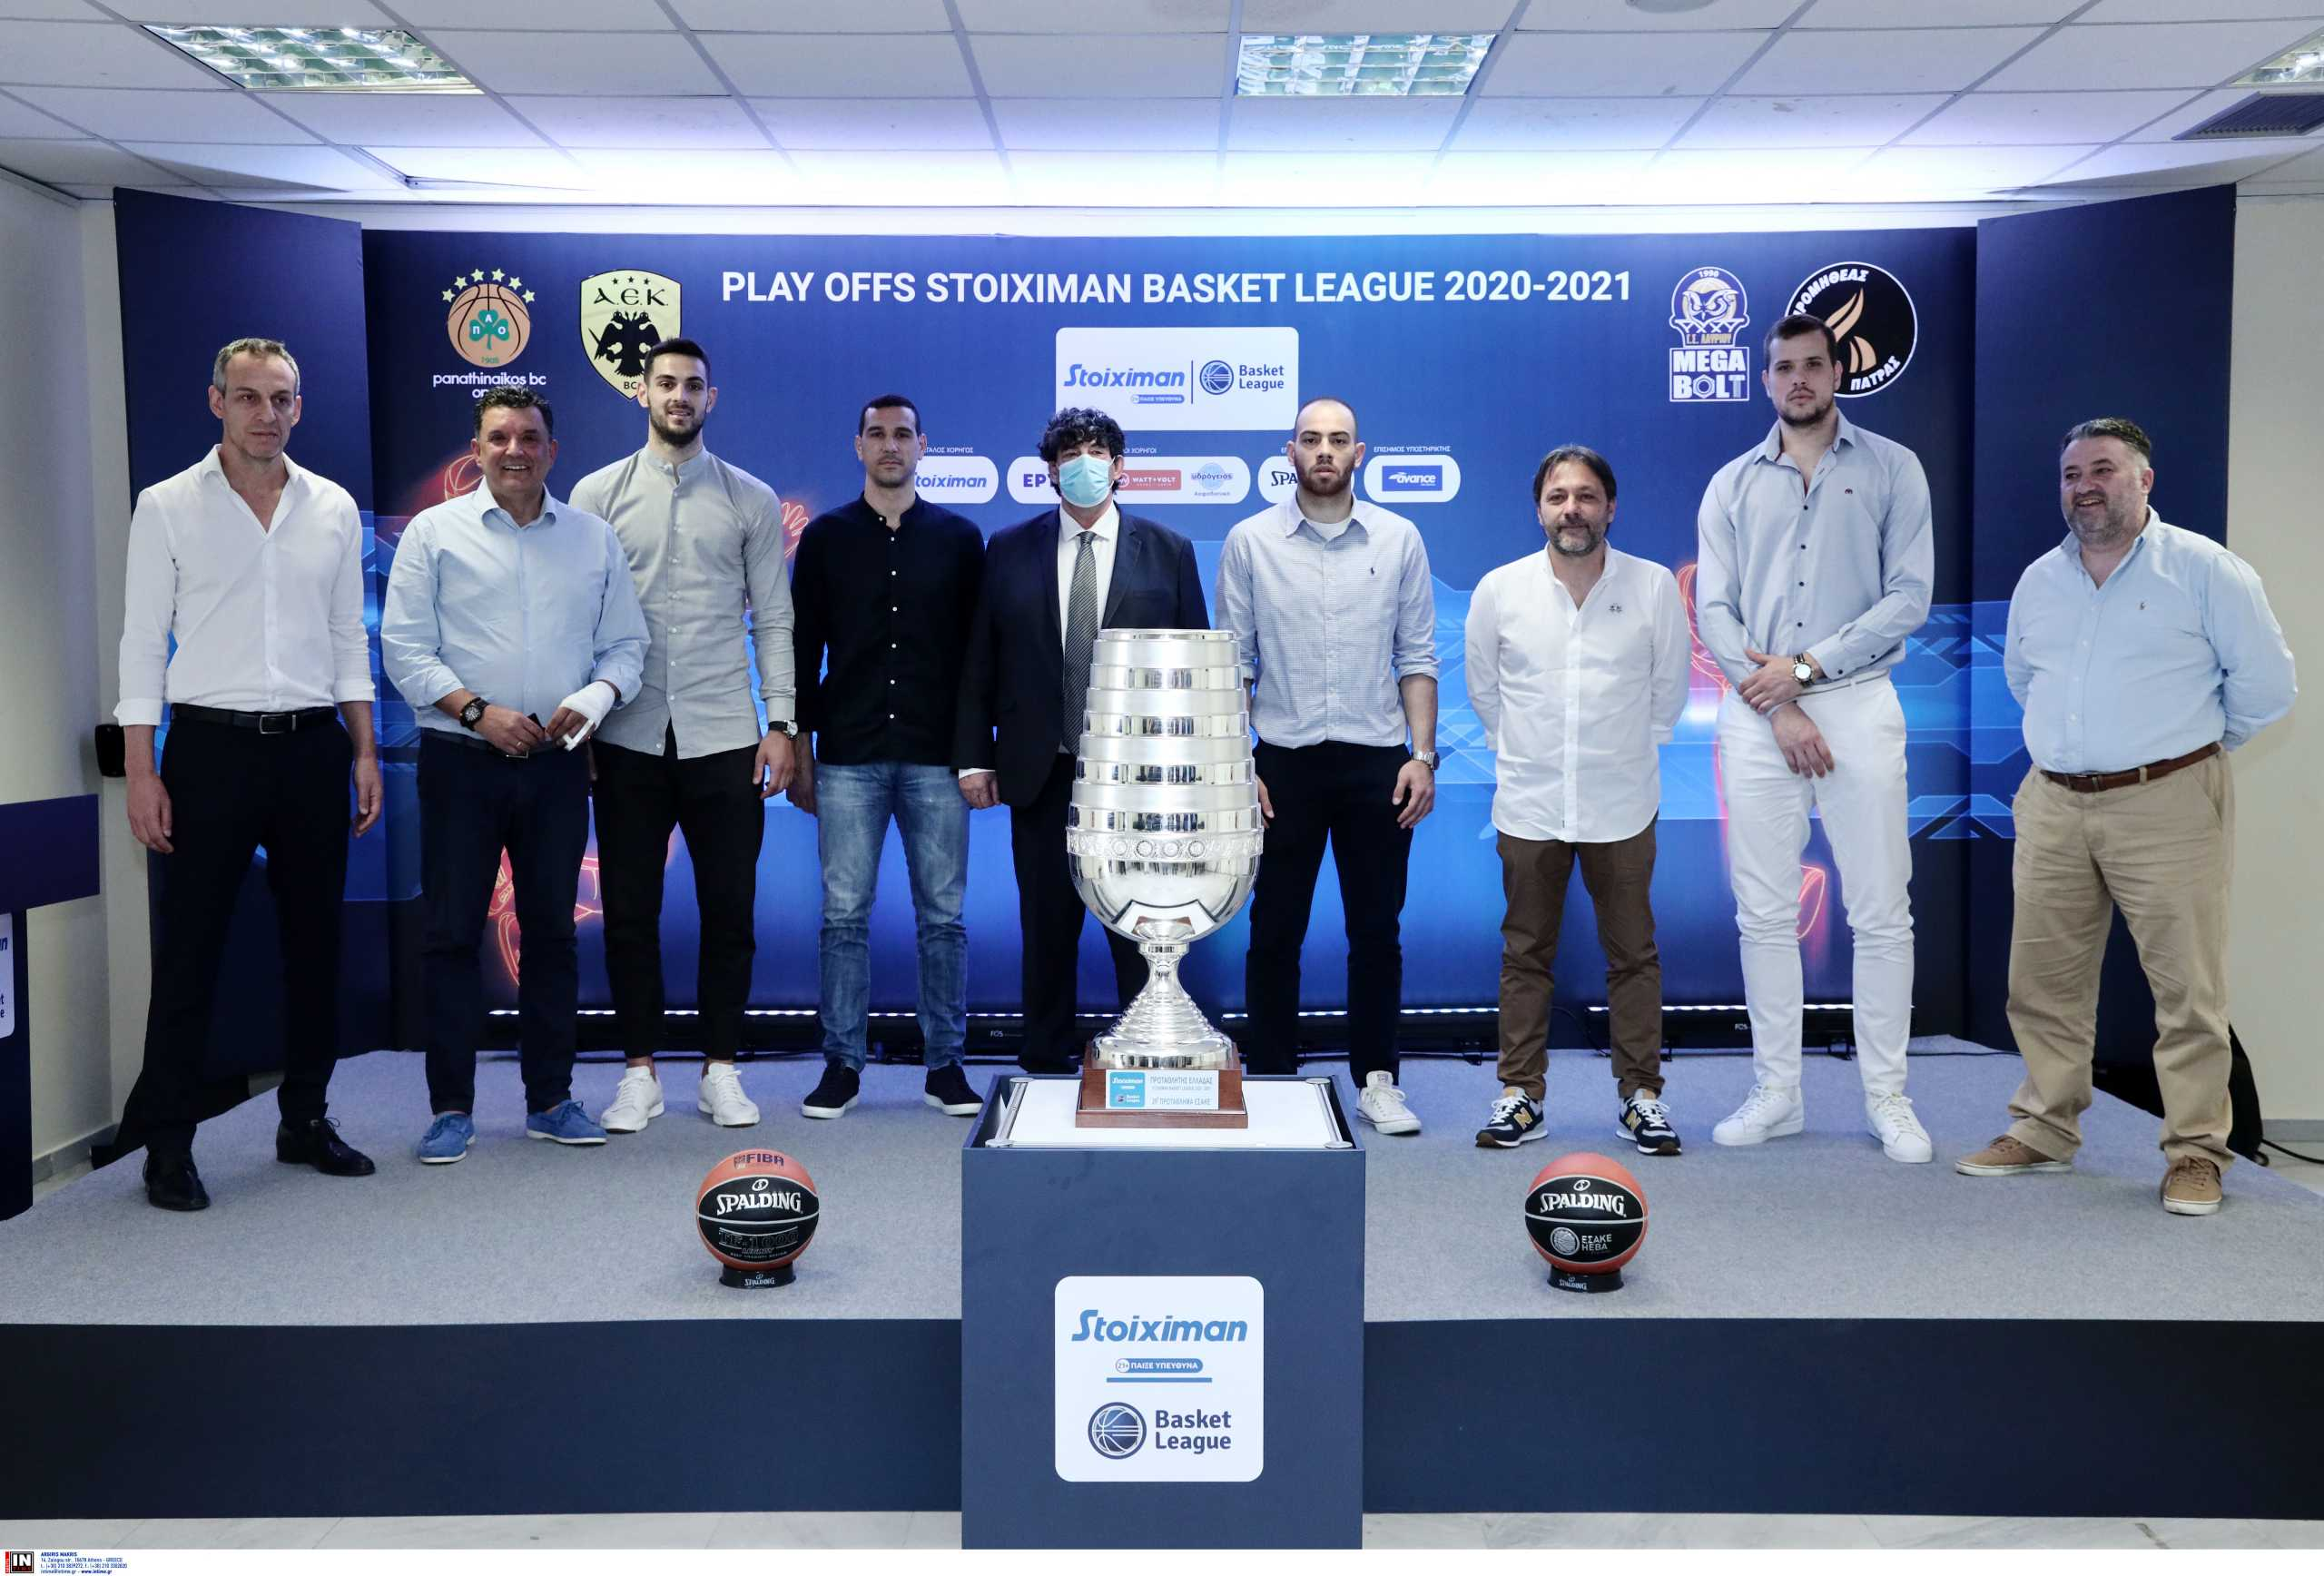 Basket League: Το τρόπαιο και οι πρωταγωνιστές